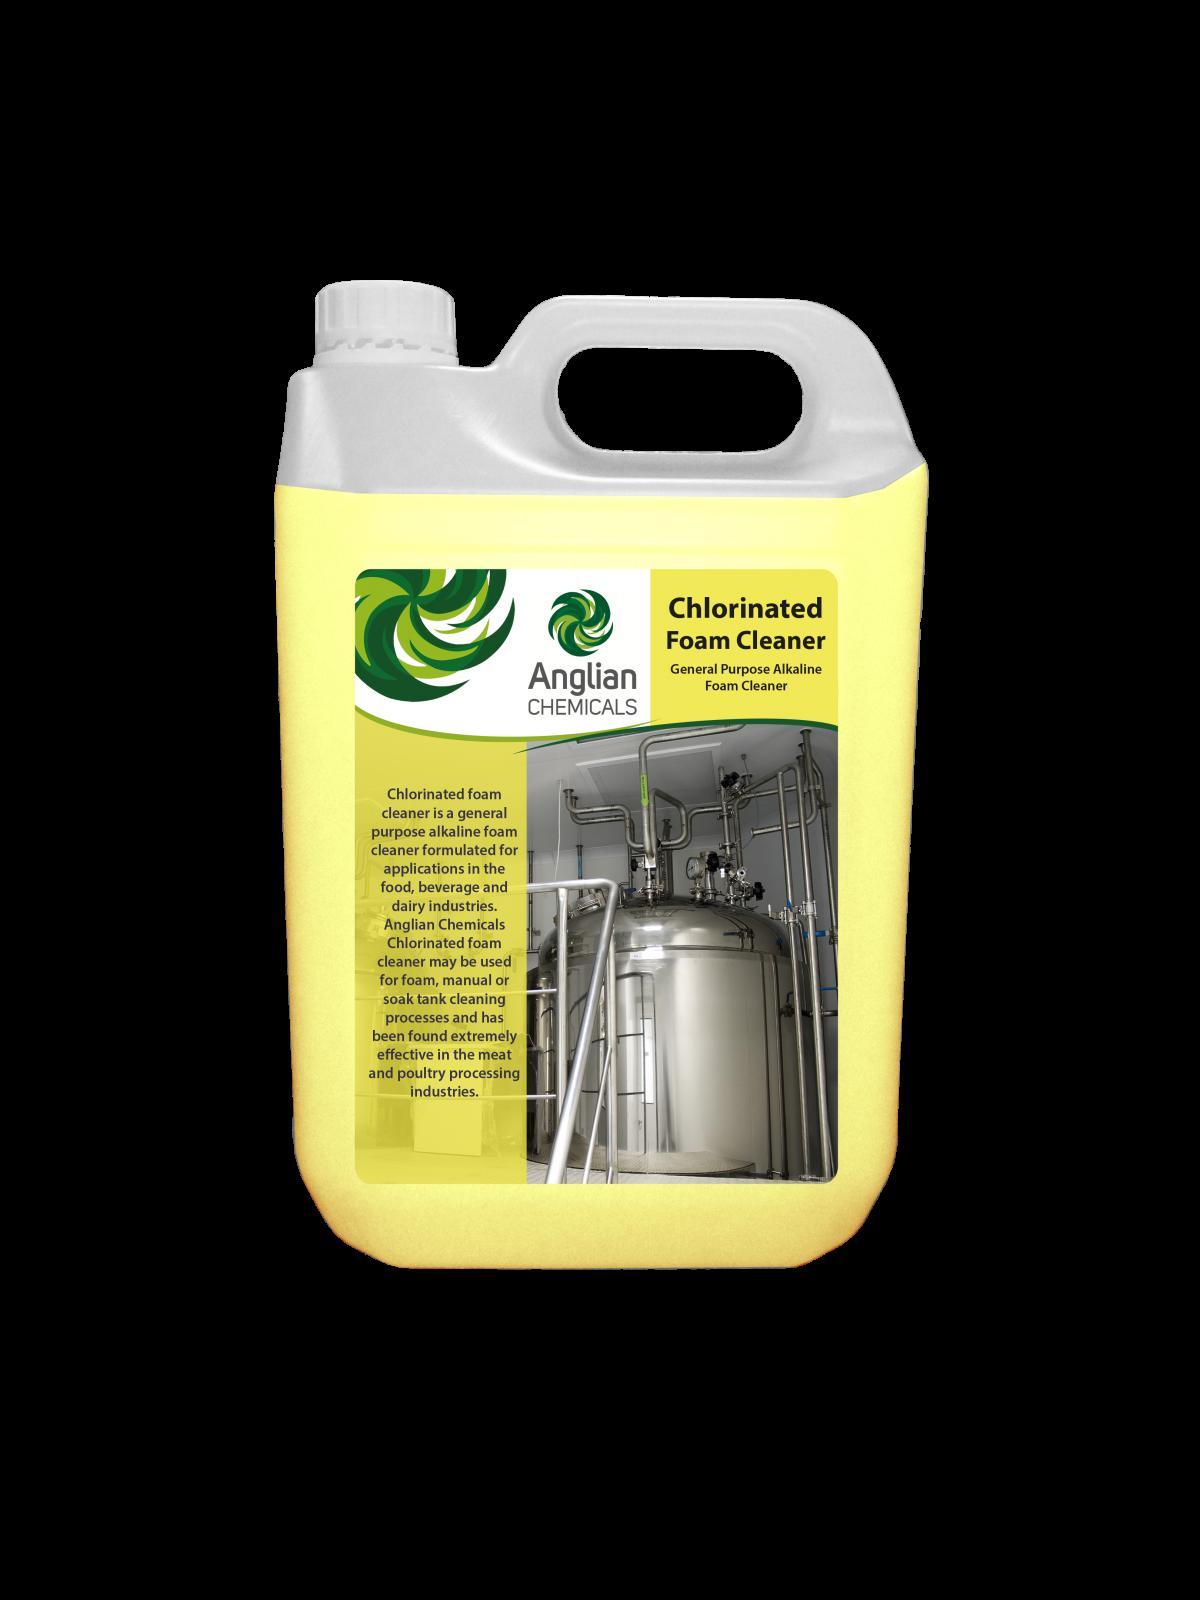 Chlorinated Foam Cleaner